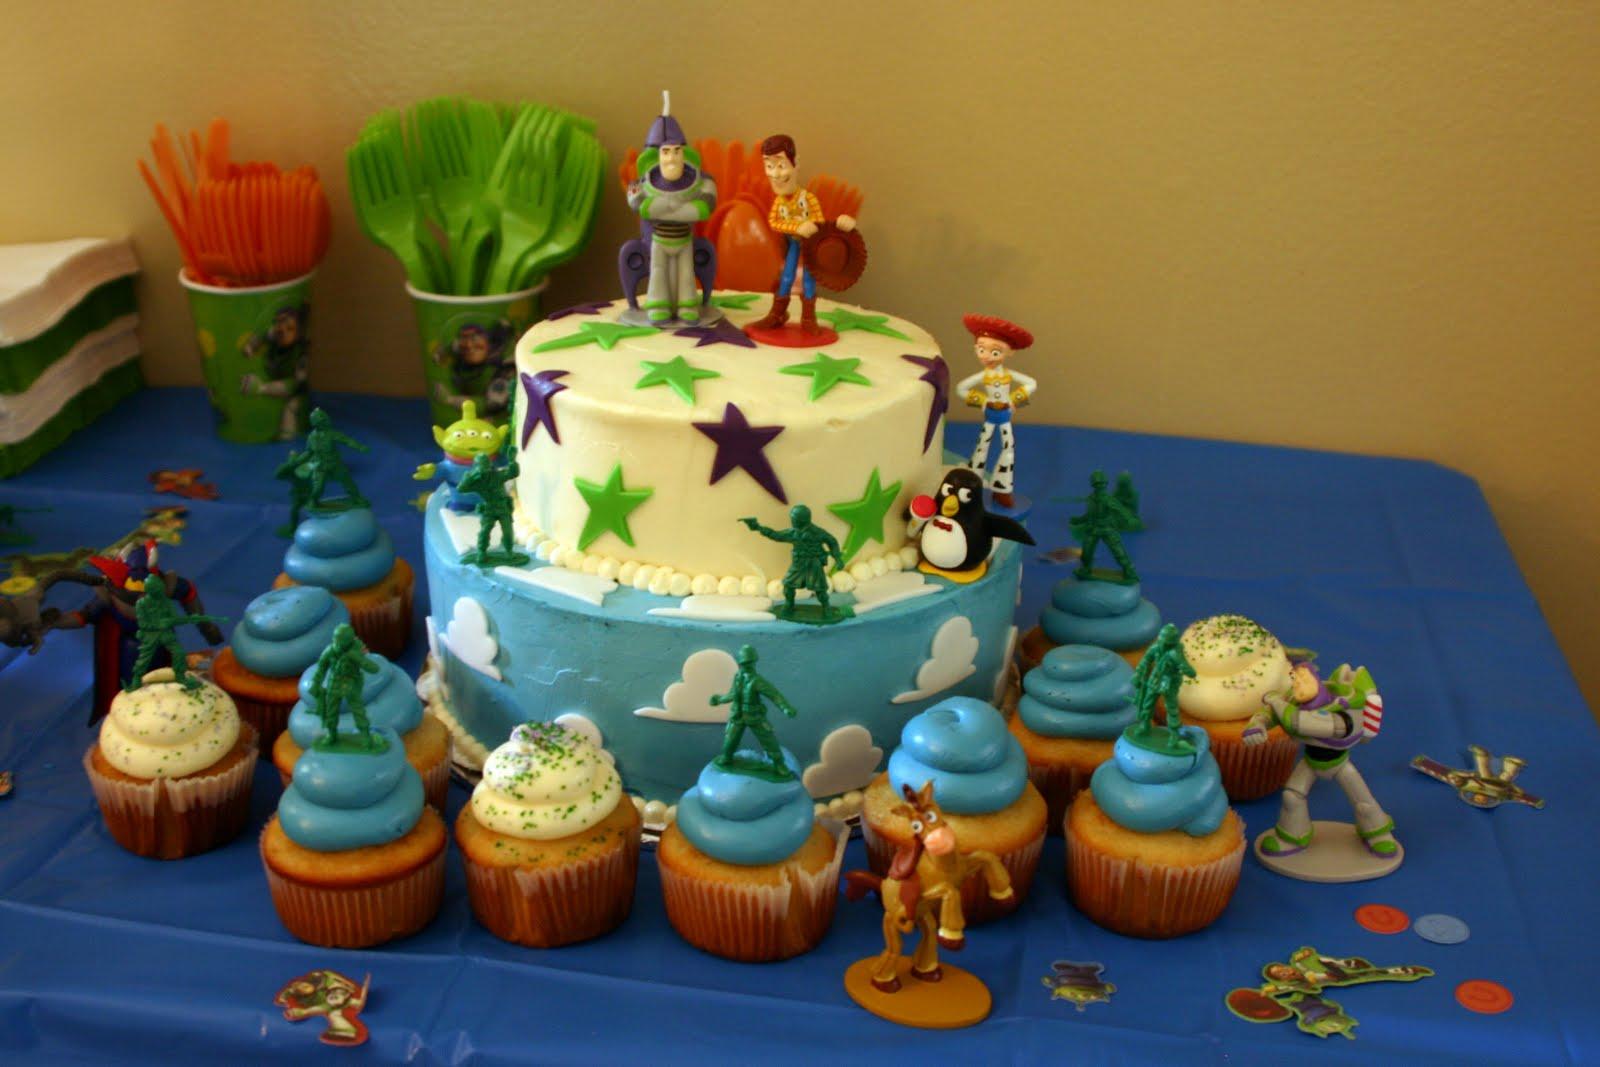 Sweet Lavender Bake Shoppe Toy Story Themed 5th Birthday